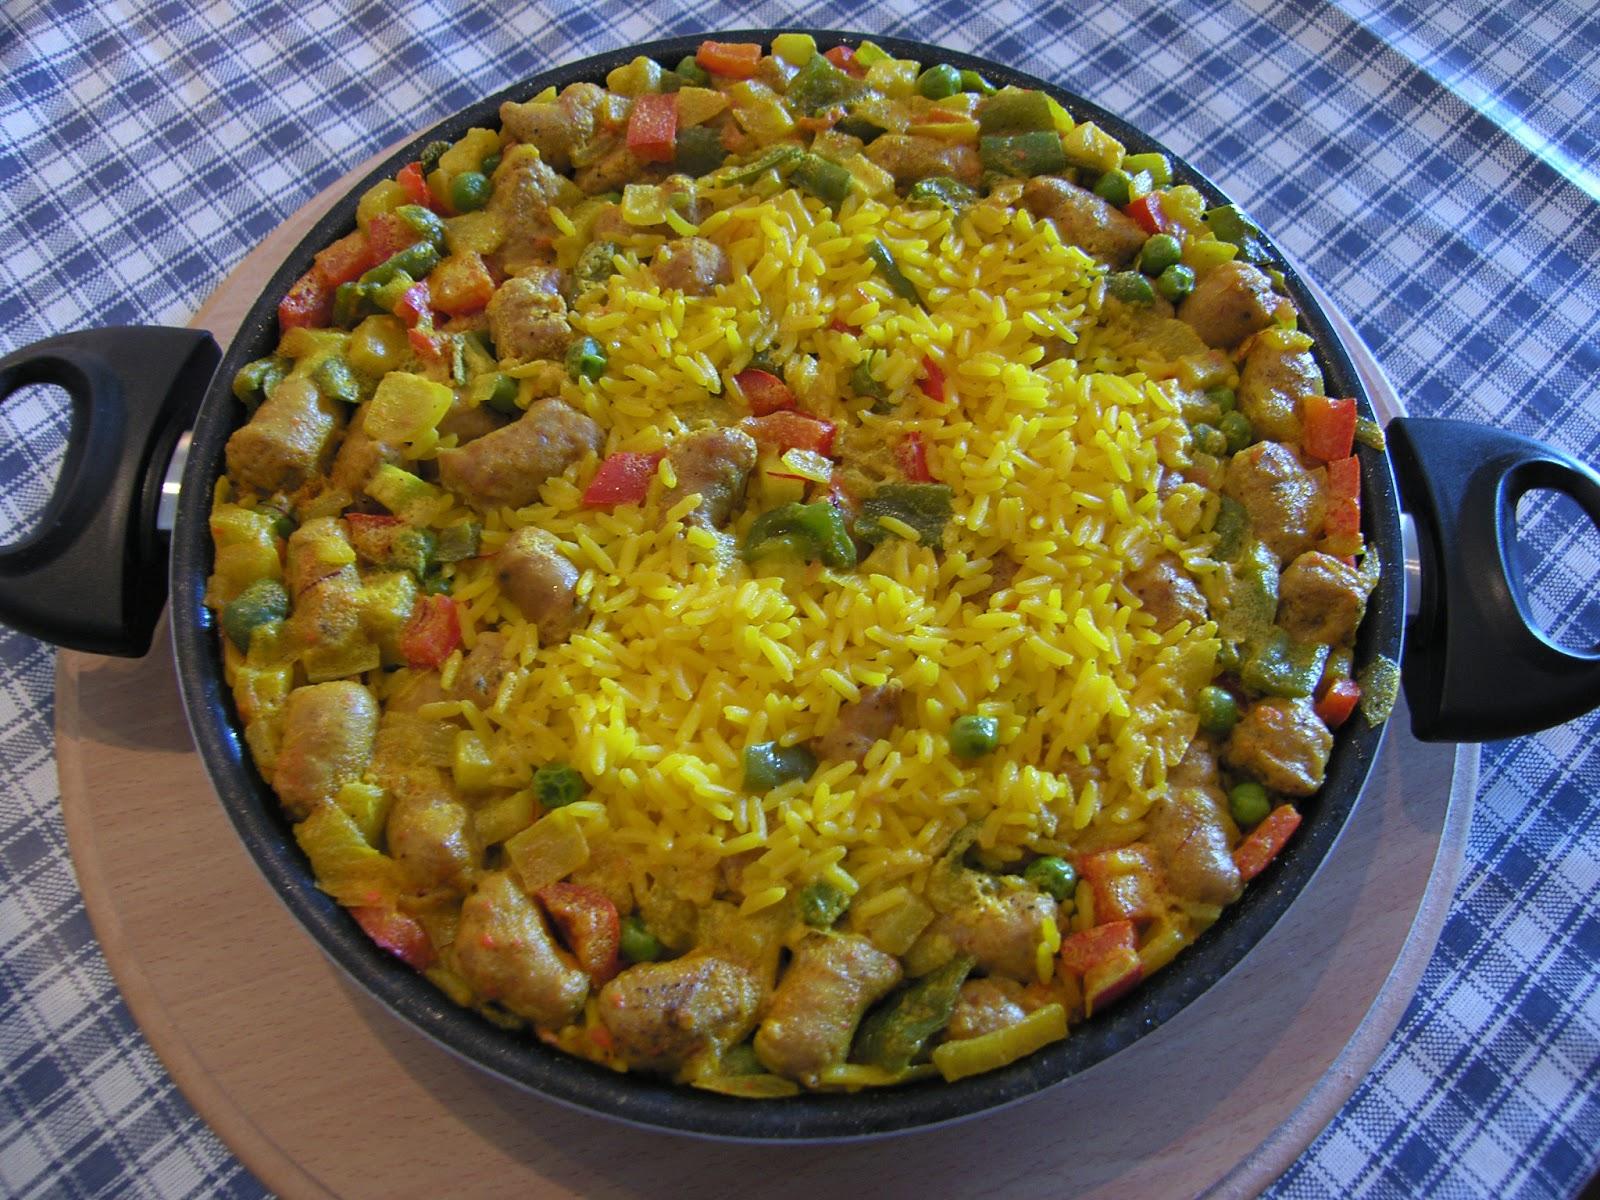 Paella de arroz con salchichas recetas de cocina - Cocina con sara paella ...